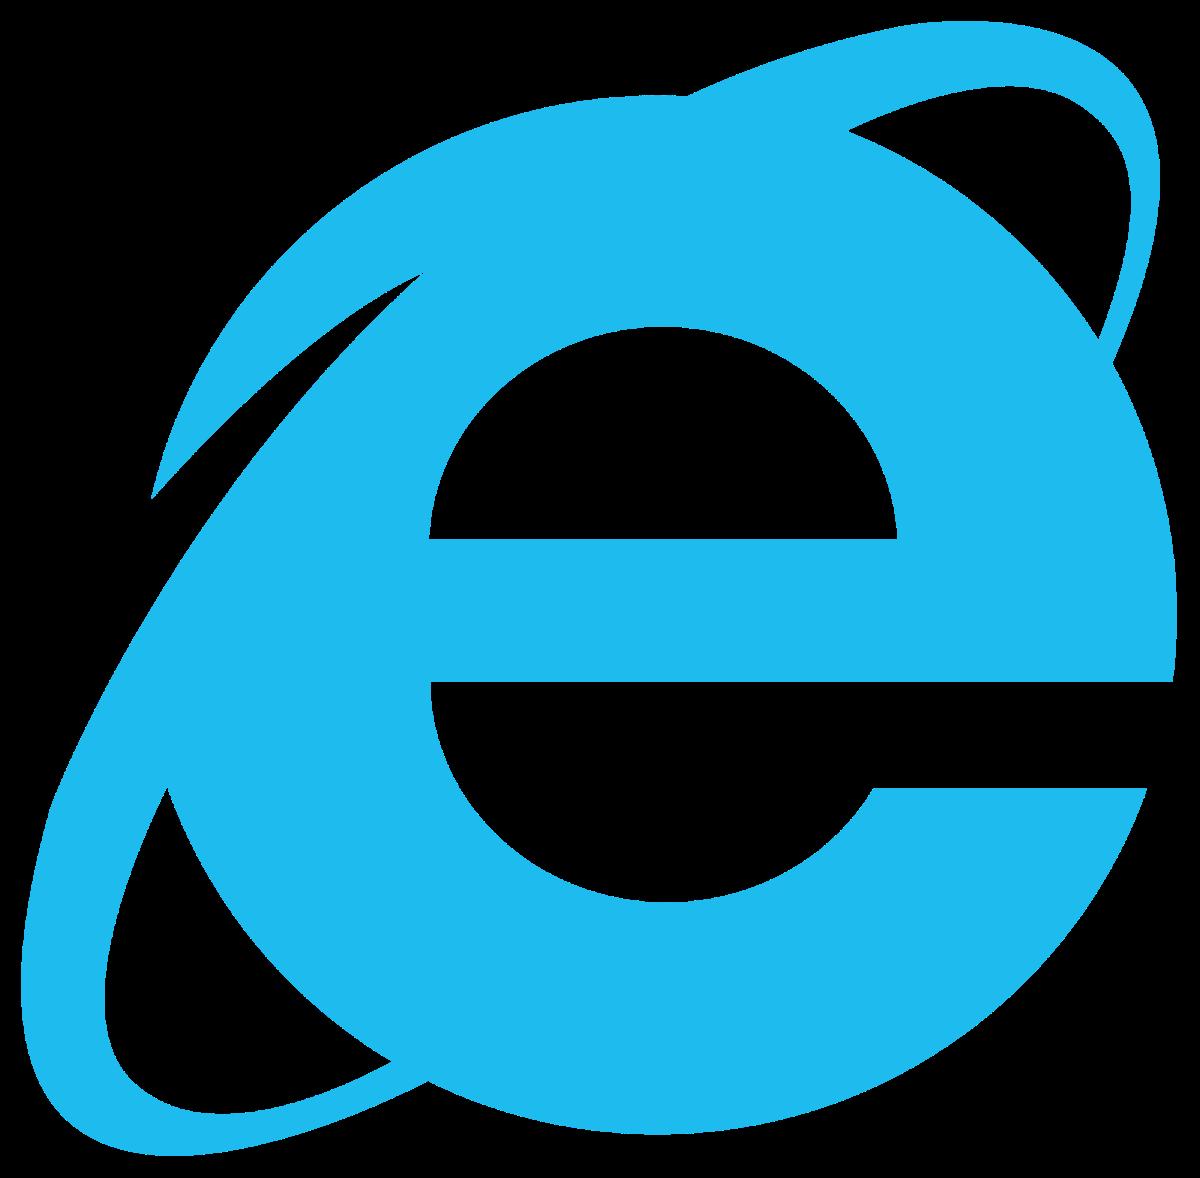 Getting App-V errors when trying to uninstall Internet Explorer Development Channel? Dothis.